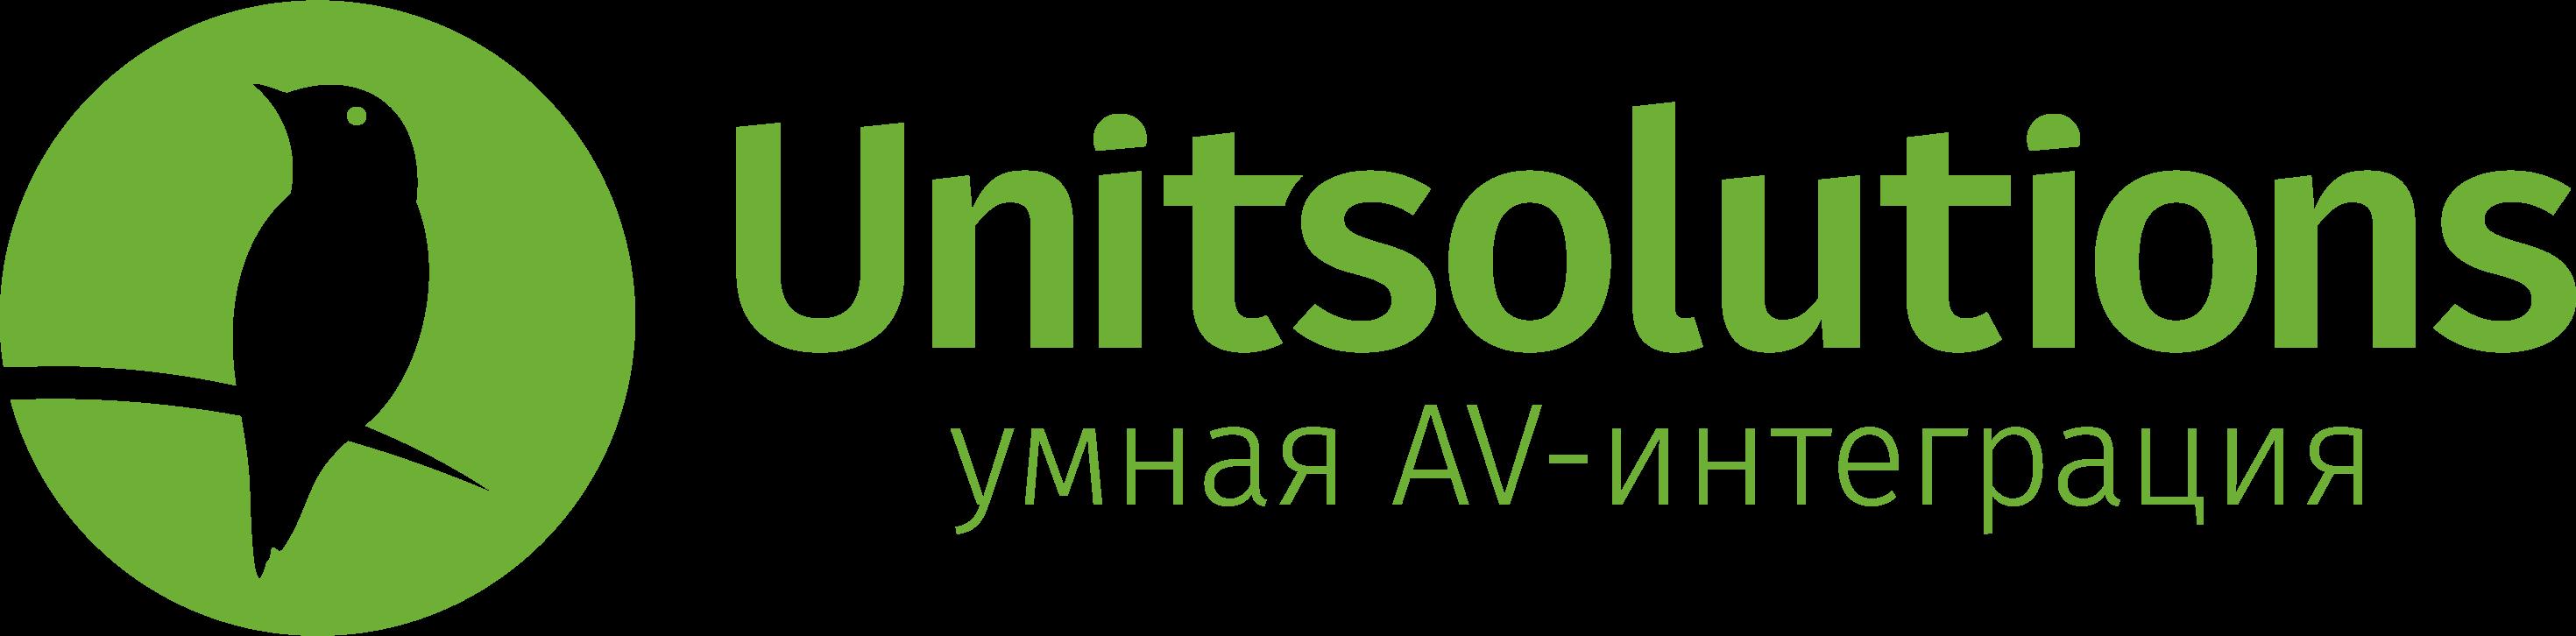 logo-V-green